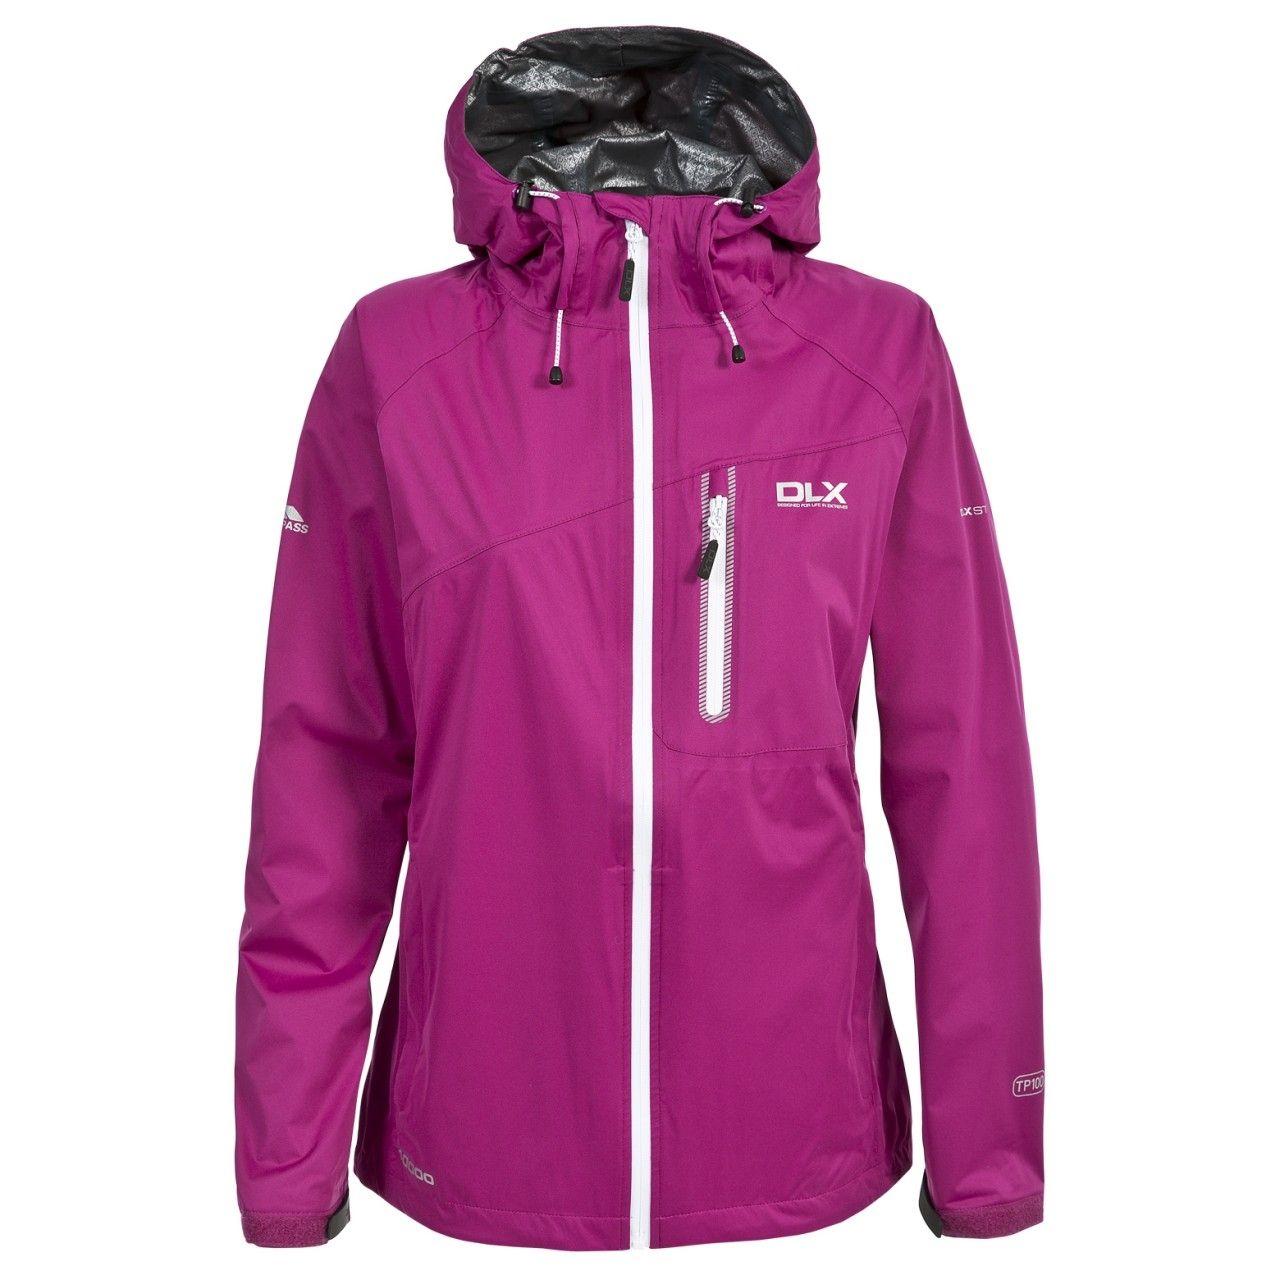 Dlx Womens Erika Waterproof Jacket